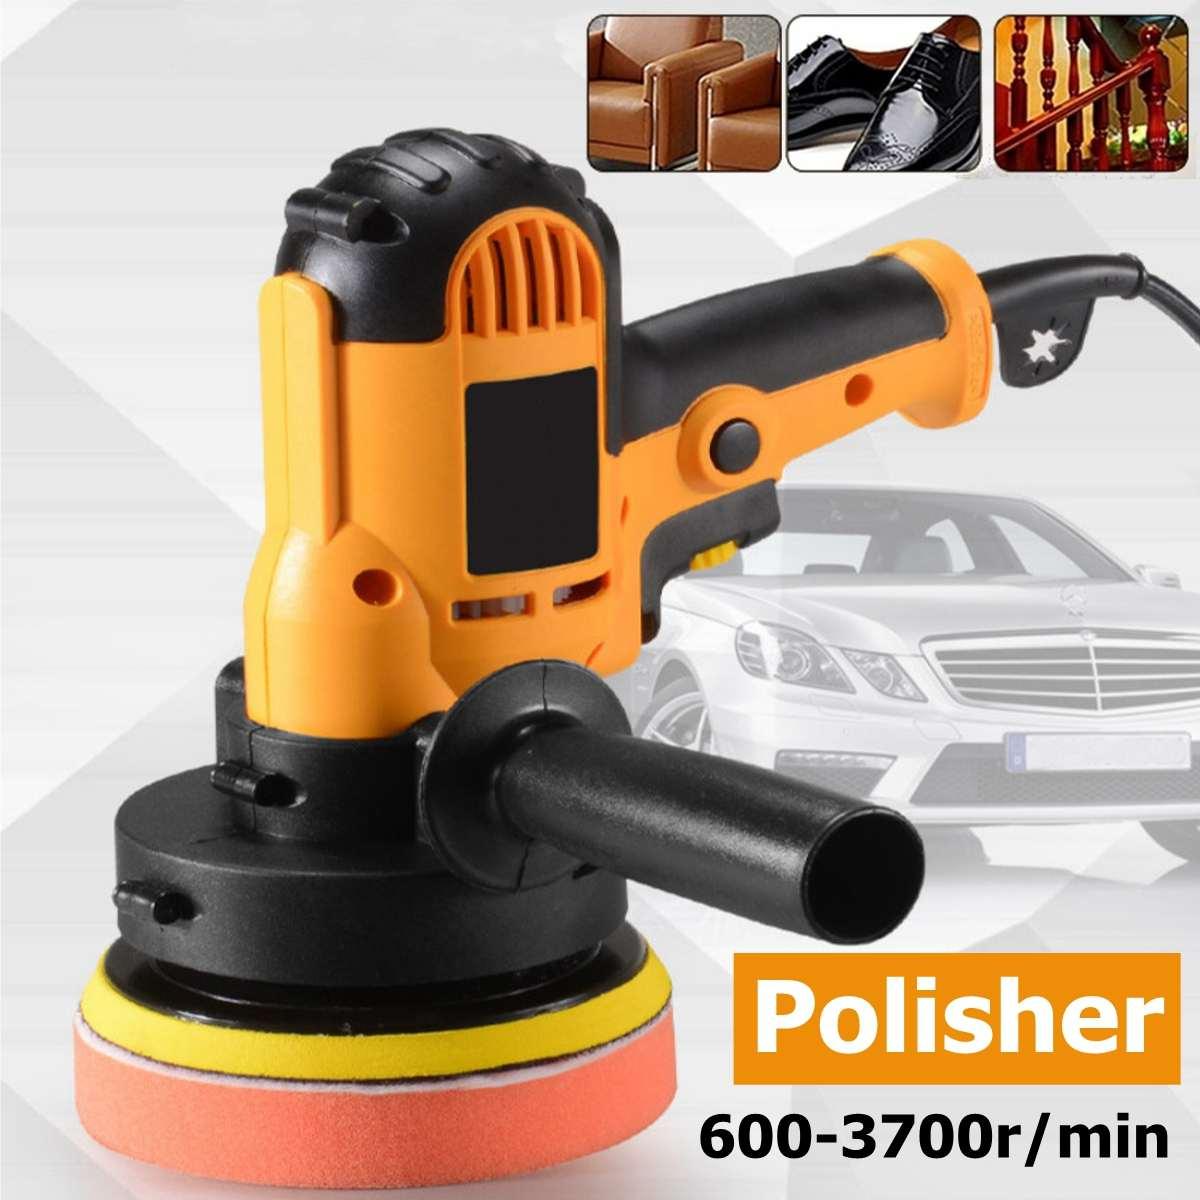 700W Buffer Car Polisher Electric Car Polisher Waxer Variable Speeds Tool Household Waxing Polishing Machine